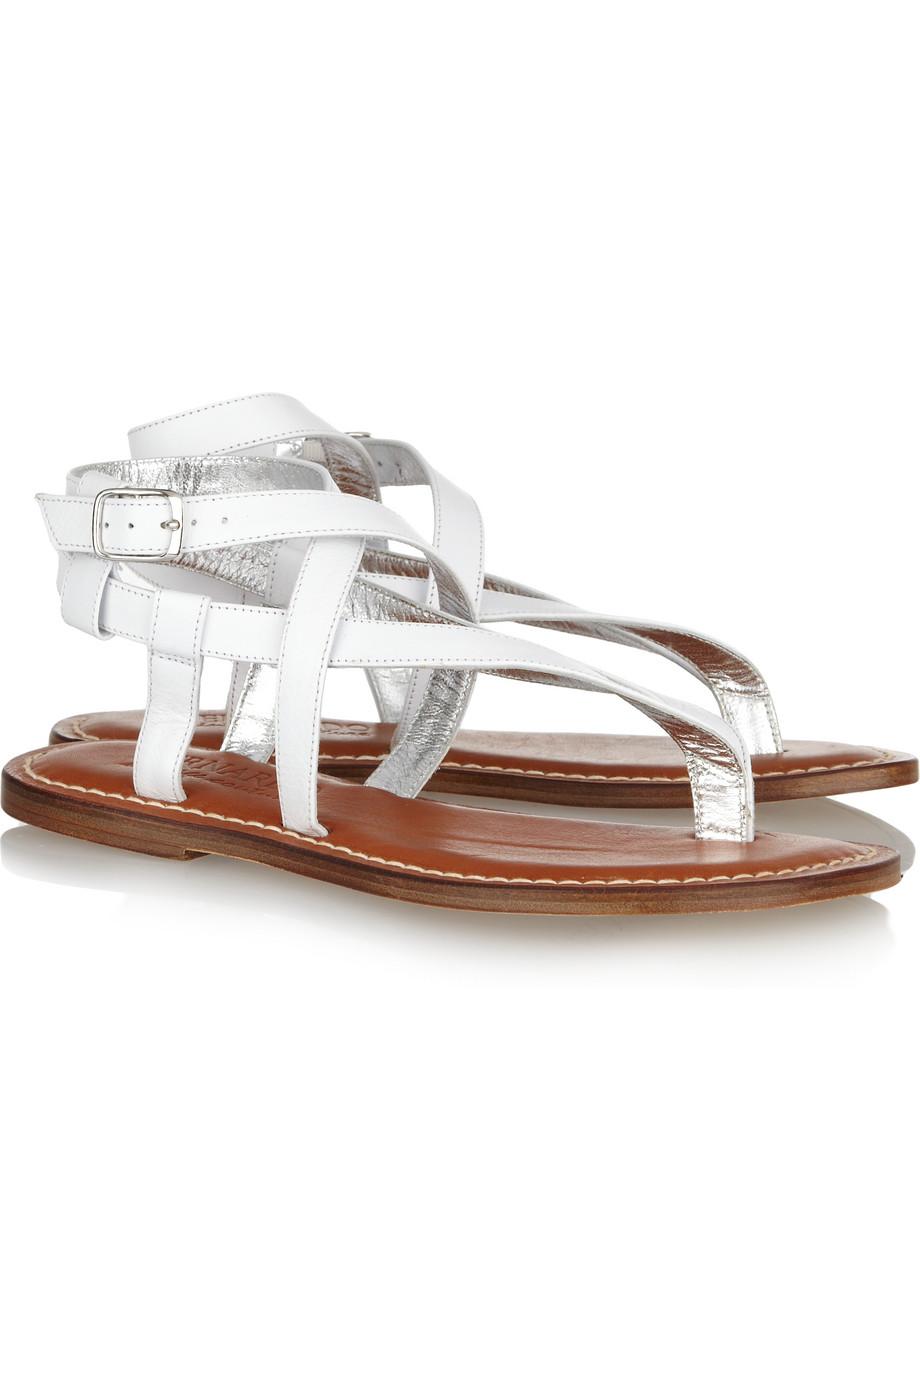 Bernardo Dazzling Leather Sandals In White Lyst